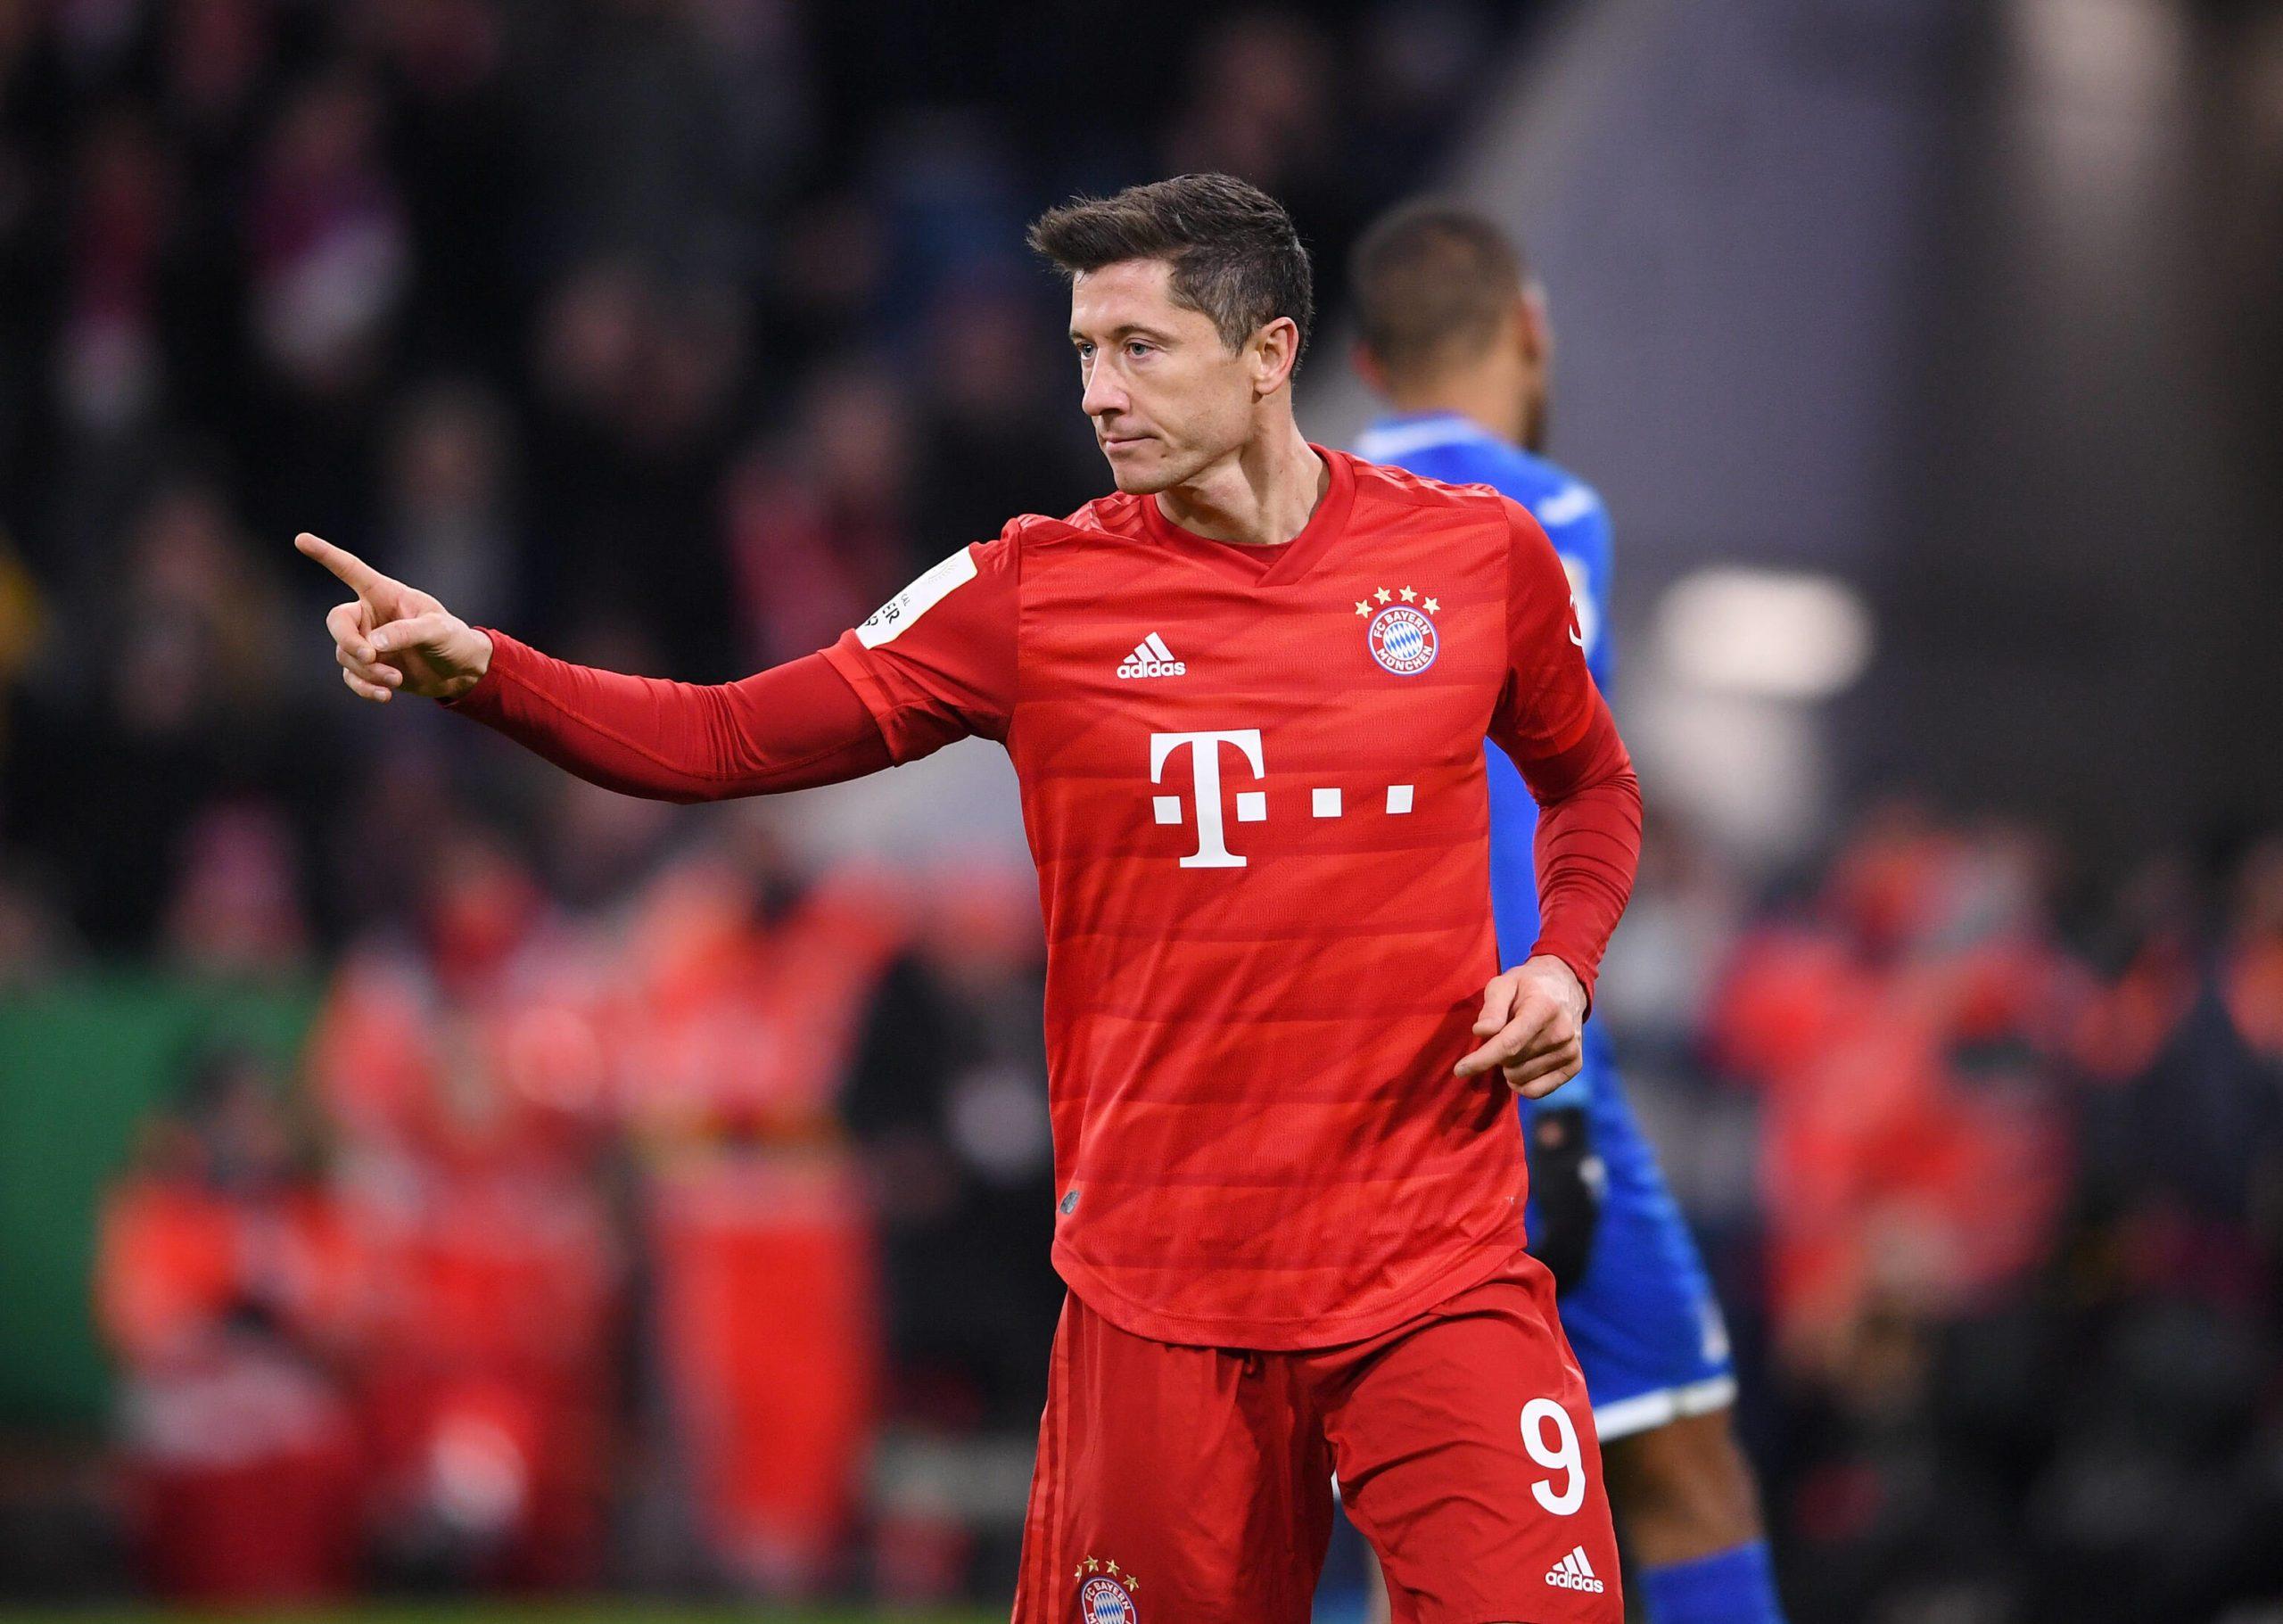 Bayern Munich vs Hoffenheim Highlights, 06/02/2020